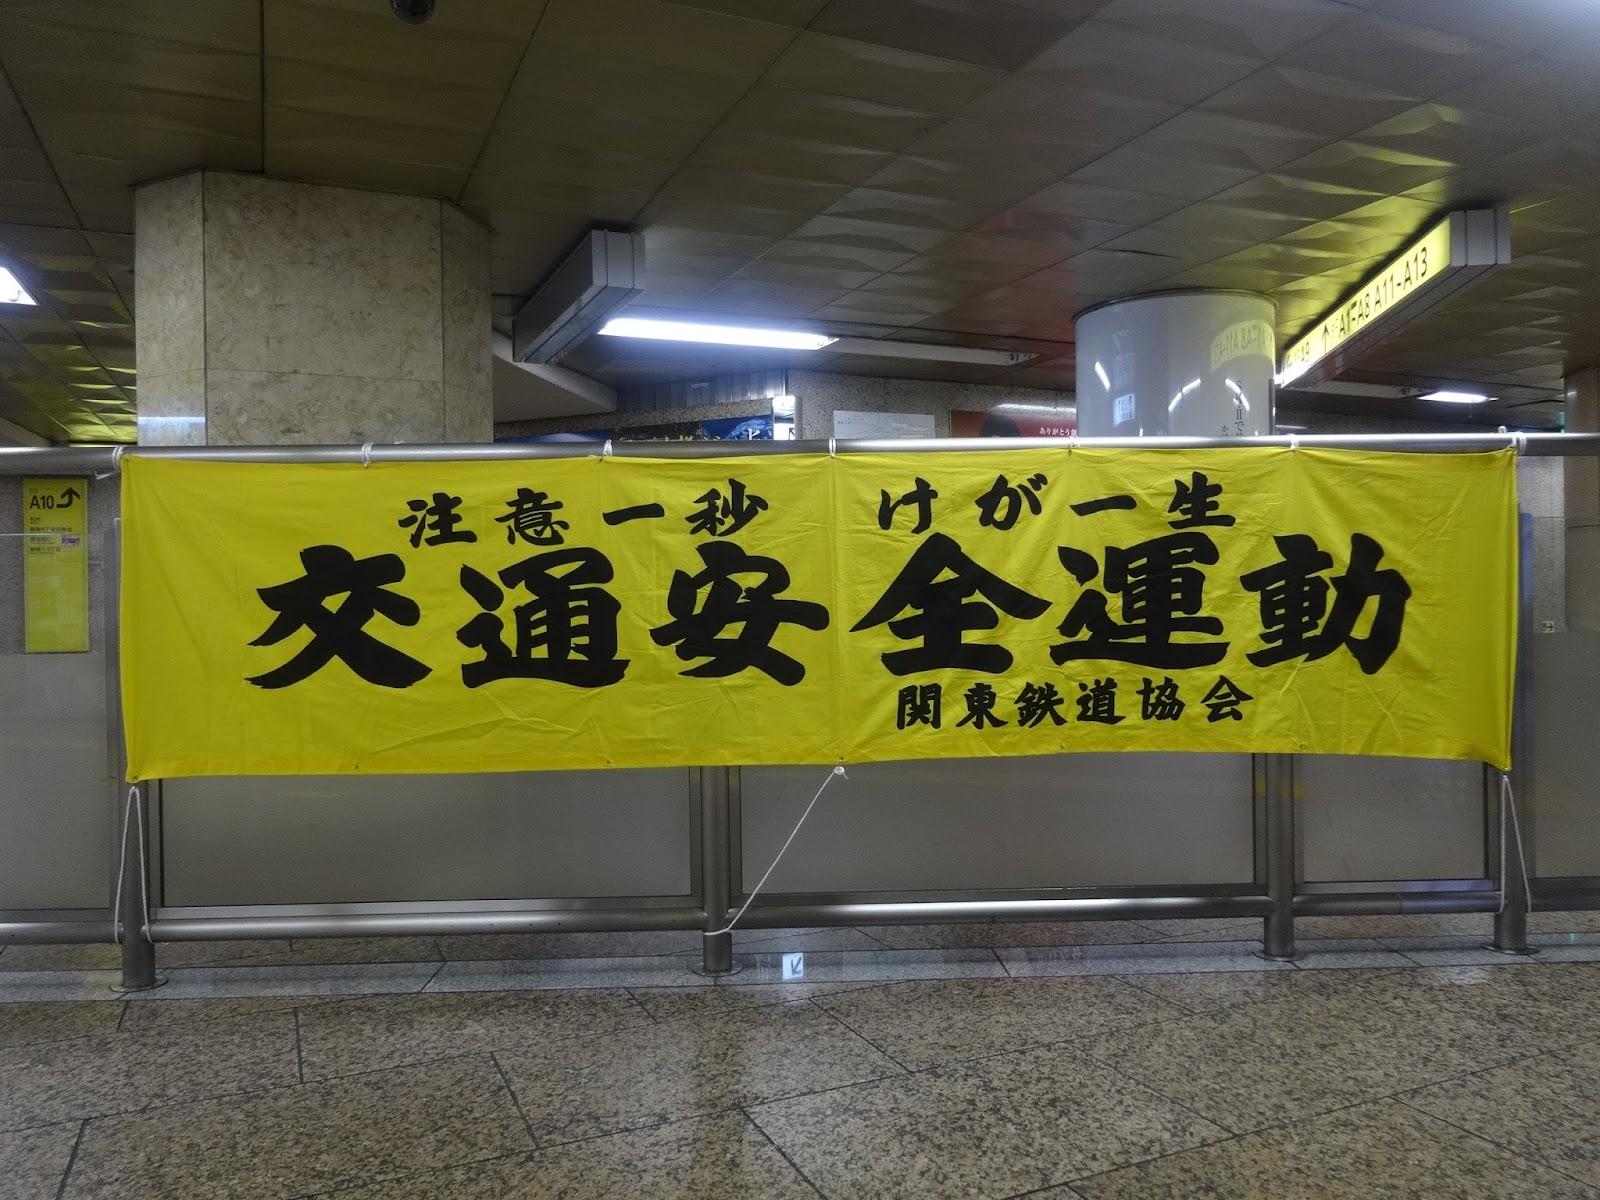 横断幕,銀座駅〈著作権フリー画像〉Free Stock Photos